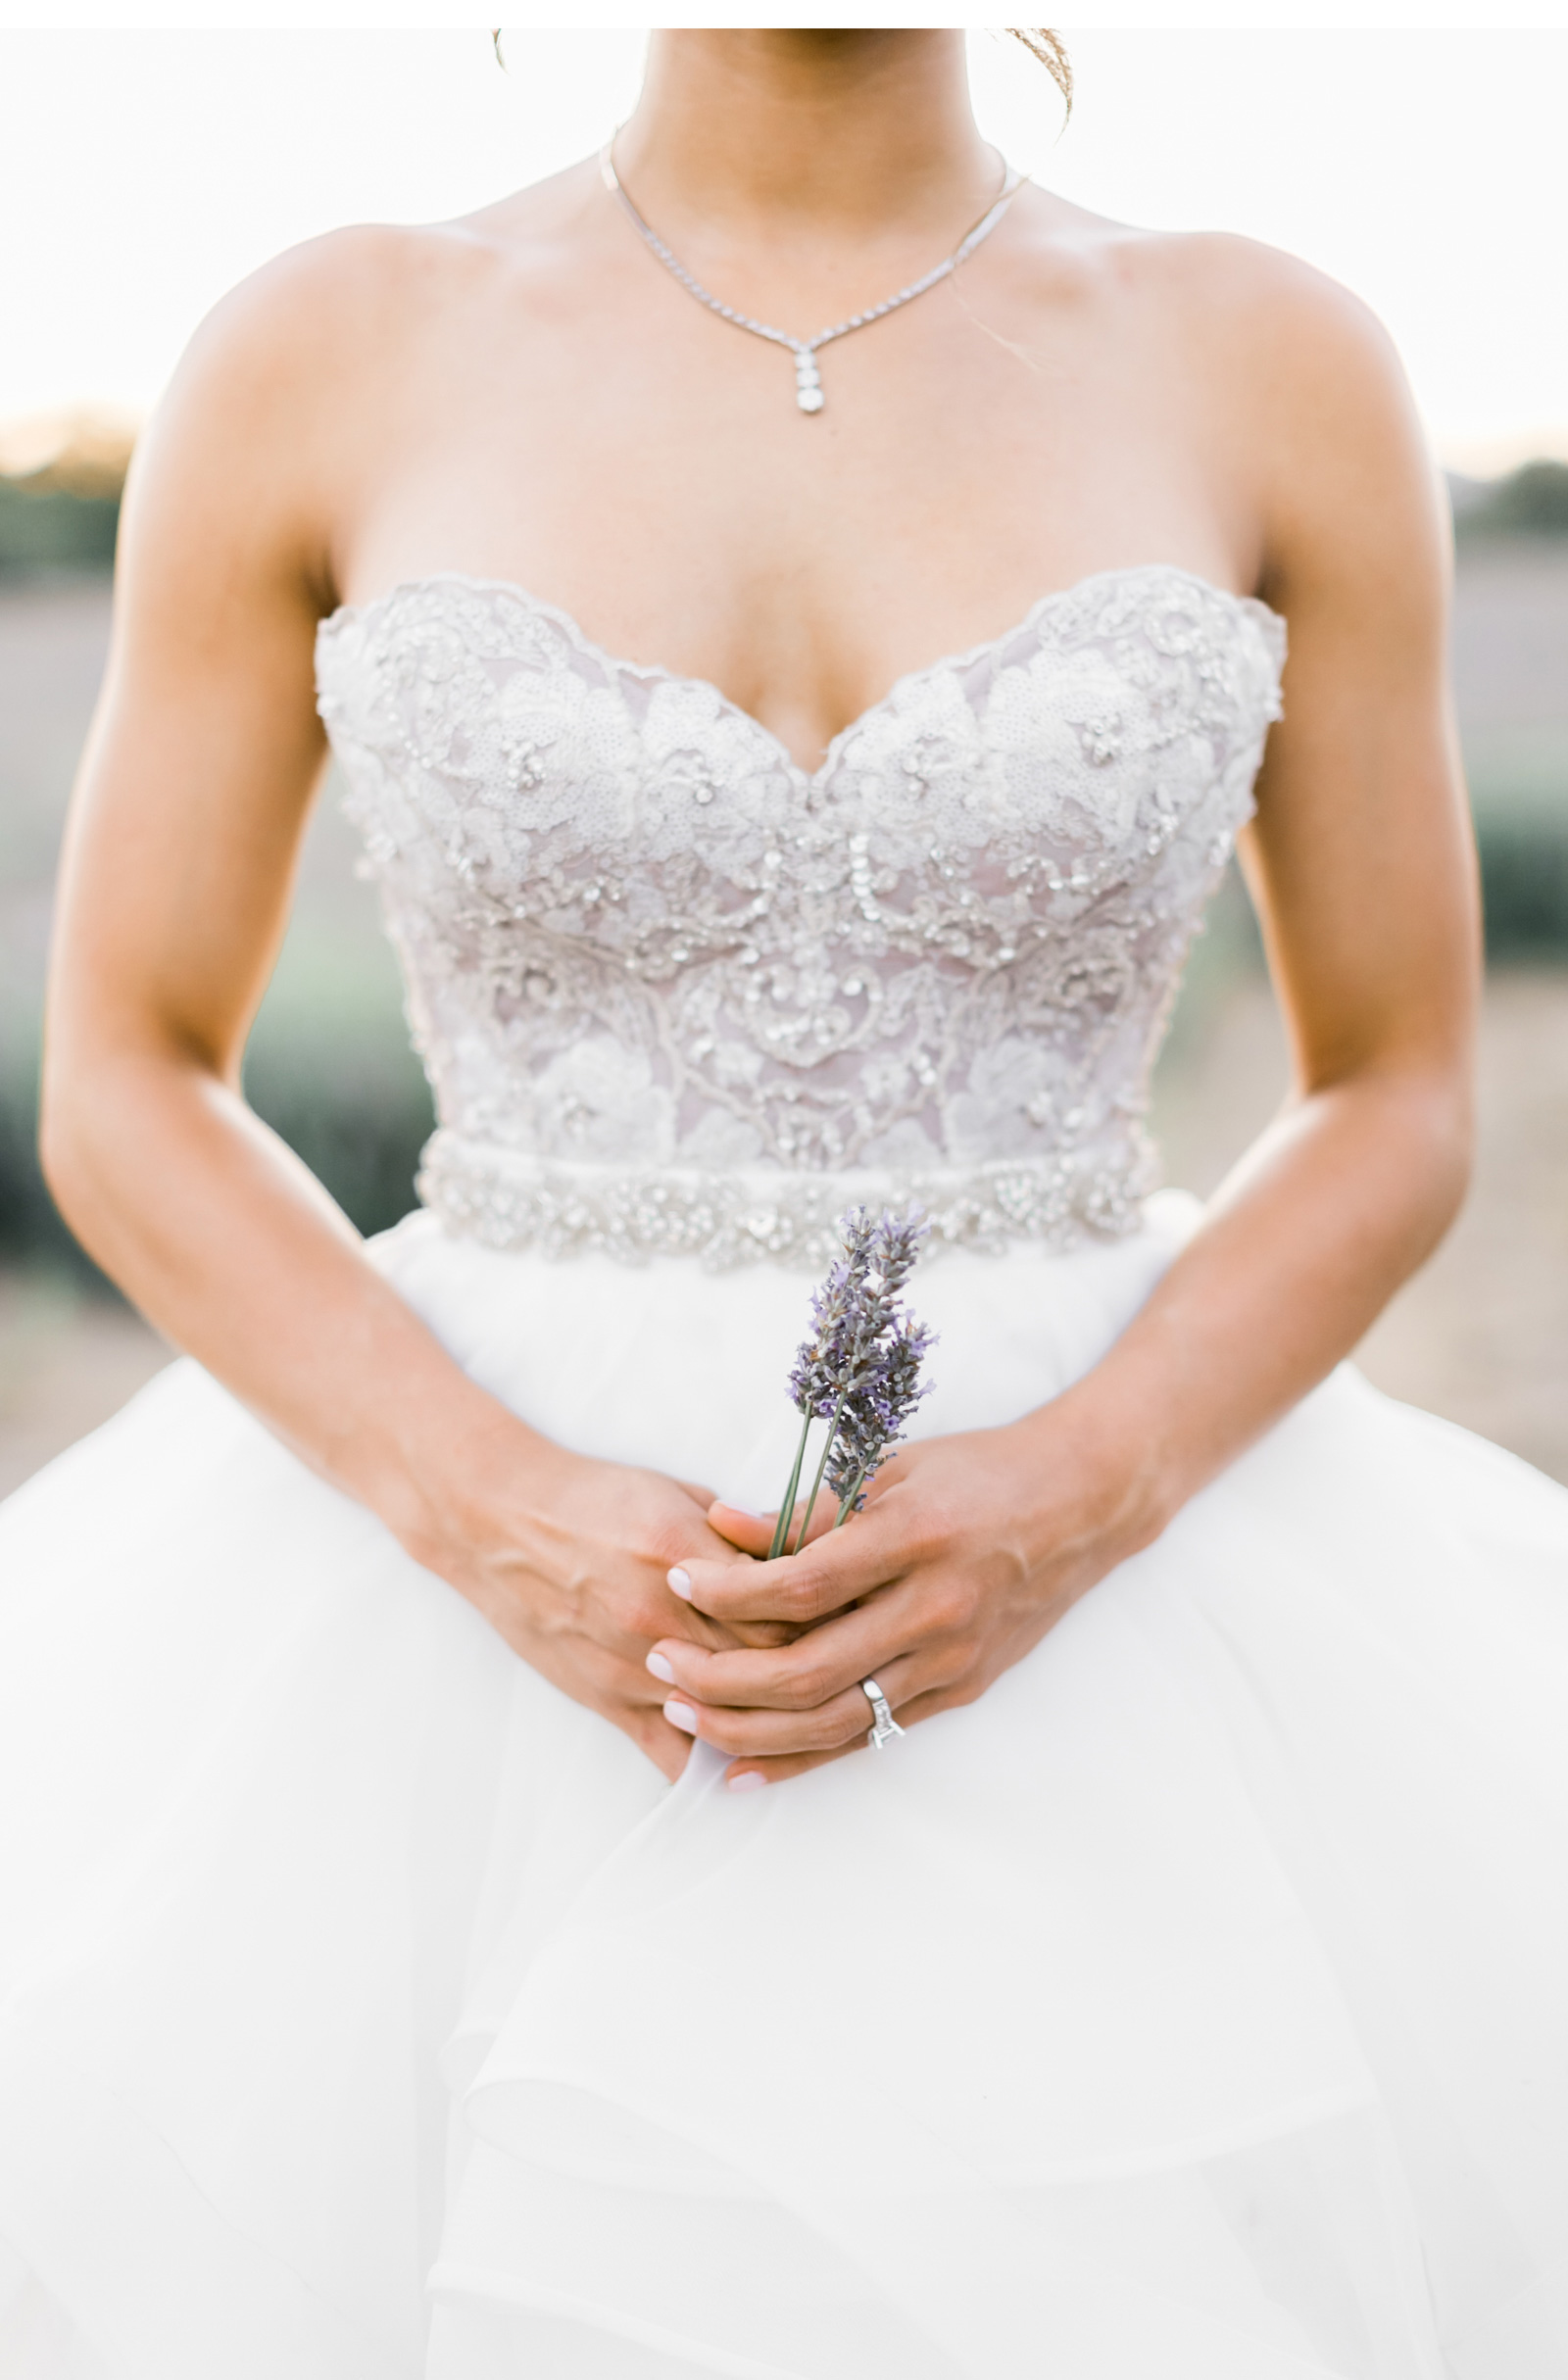 California-Lavender-Field-Wedding-Natalie-Schutt-Photography-Style-Me-Pretty_07.jpg